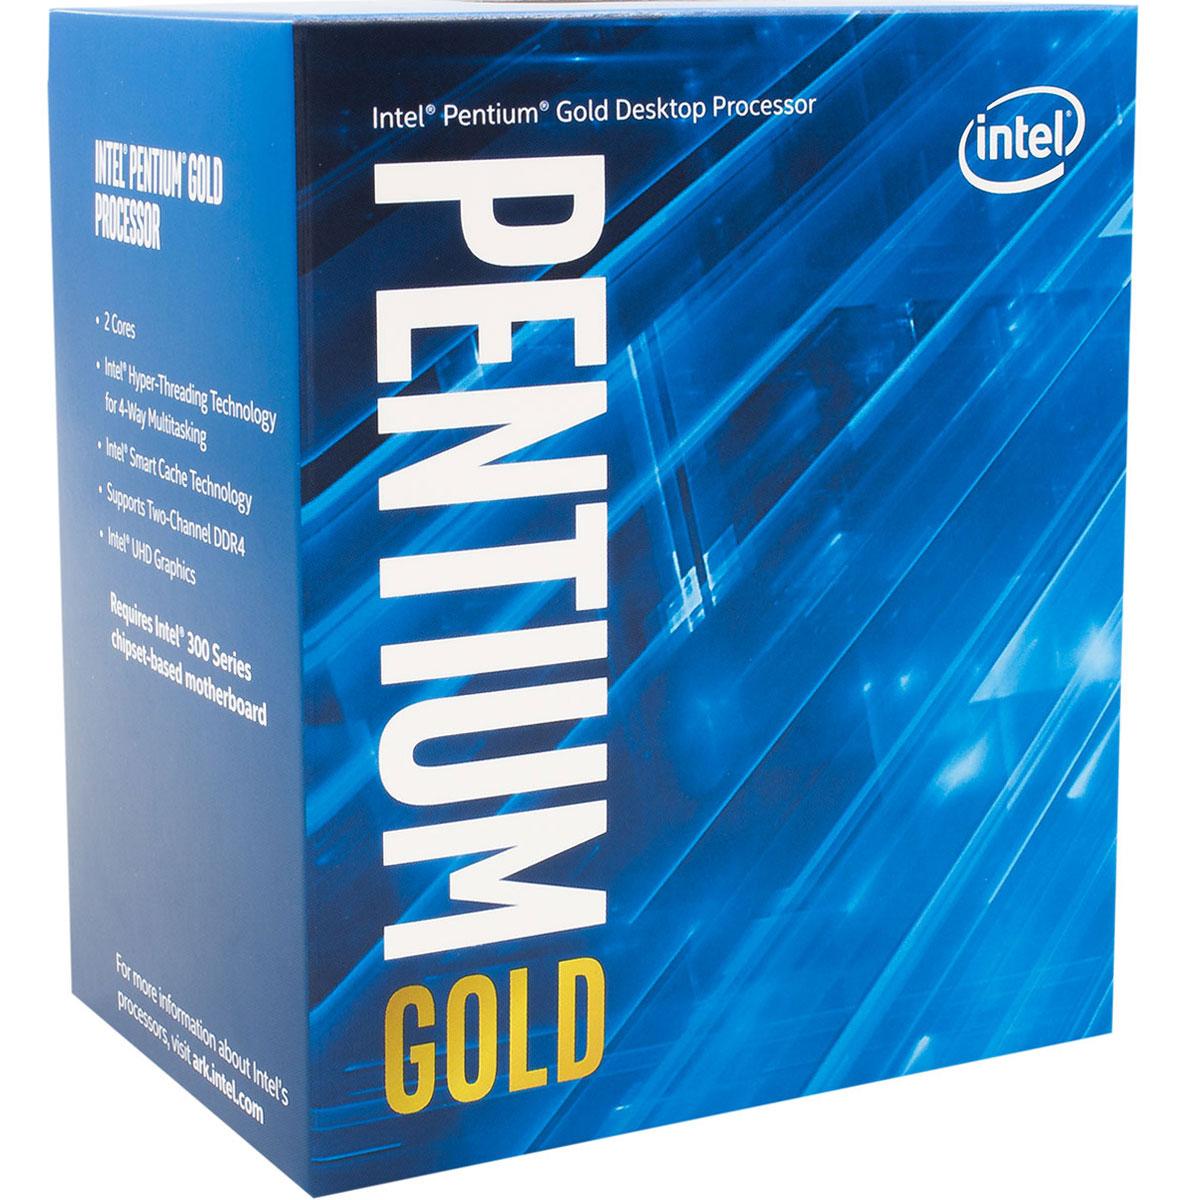 Micro Processeurs Intel Socket Lga 1151 Coffee Lake Shs Computer I3 8100 Cofeelake Series Pentium G5600 39ghz 4mb Retail